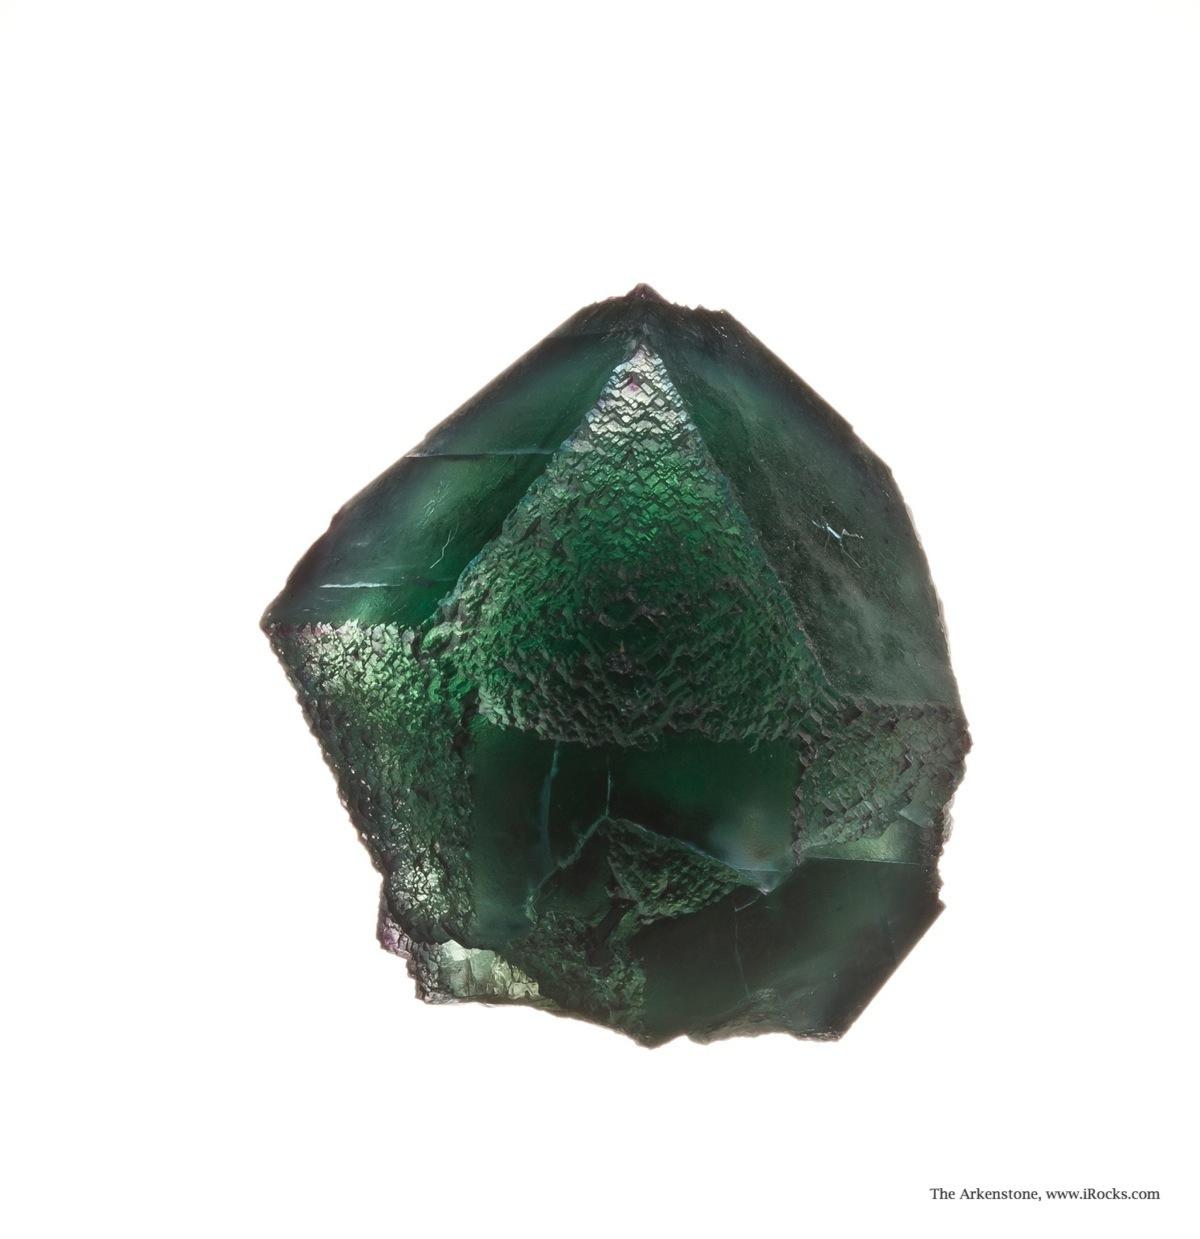 A sharp single crystal showing unusually complex crystal habit